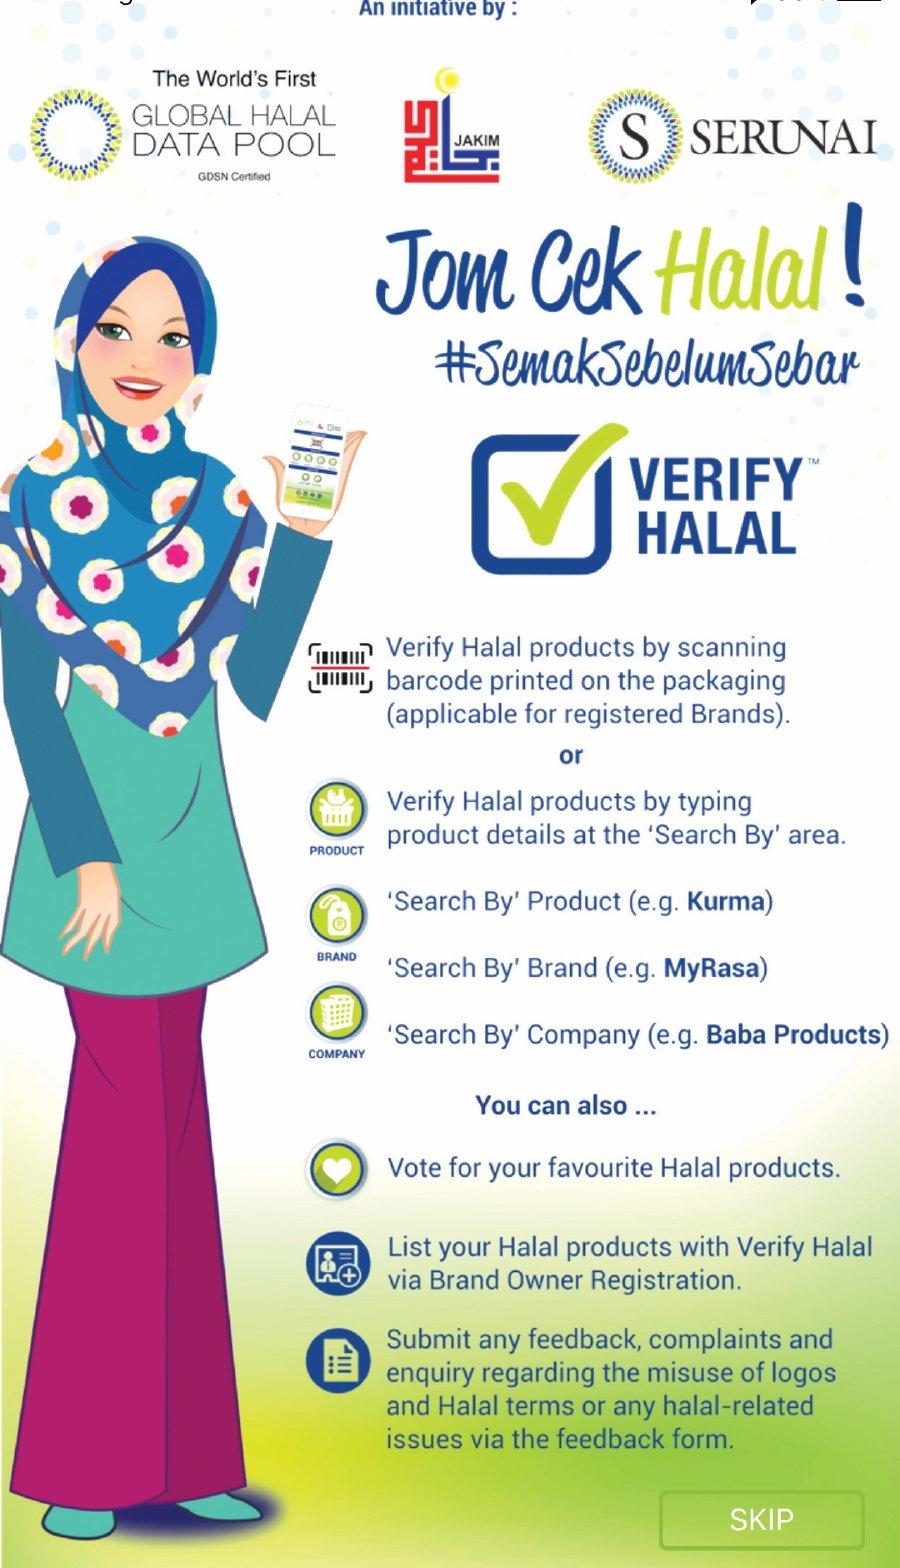 The user-friendly Verify Halal app interface.